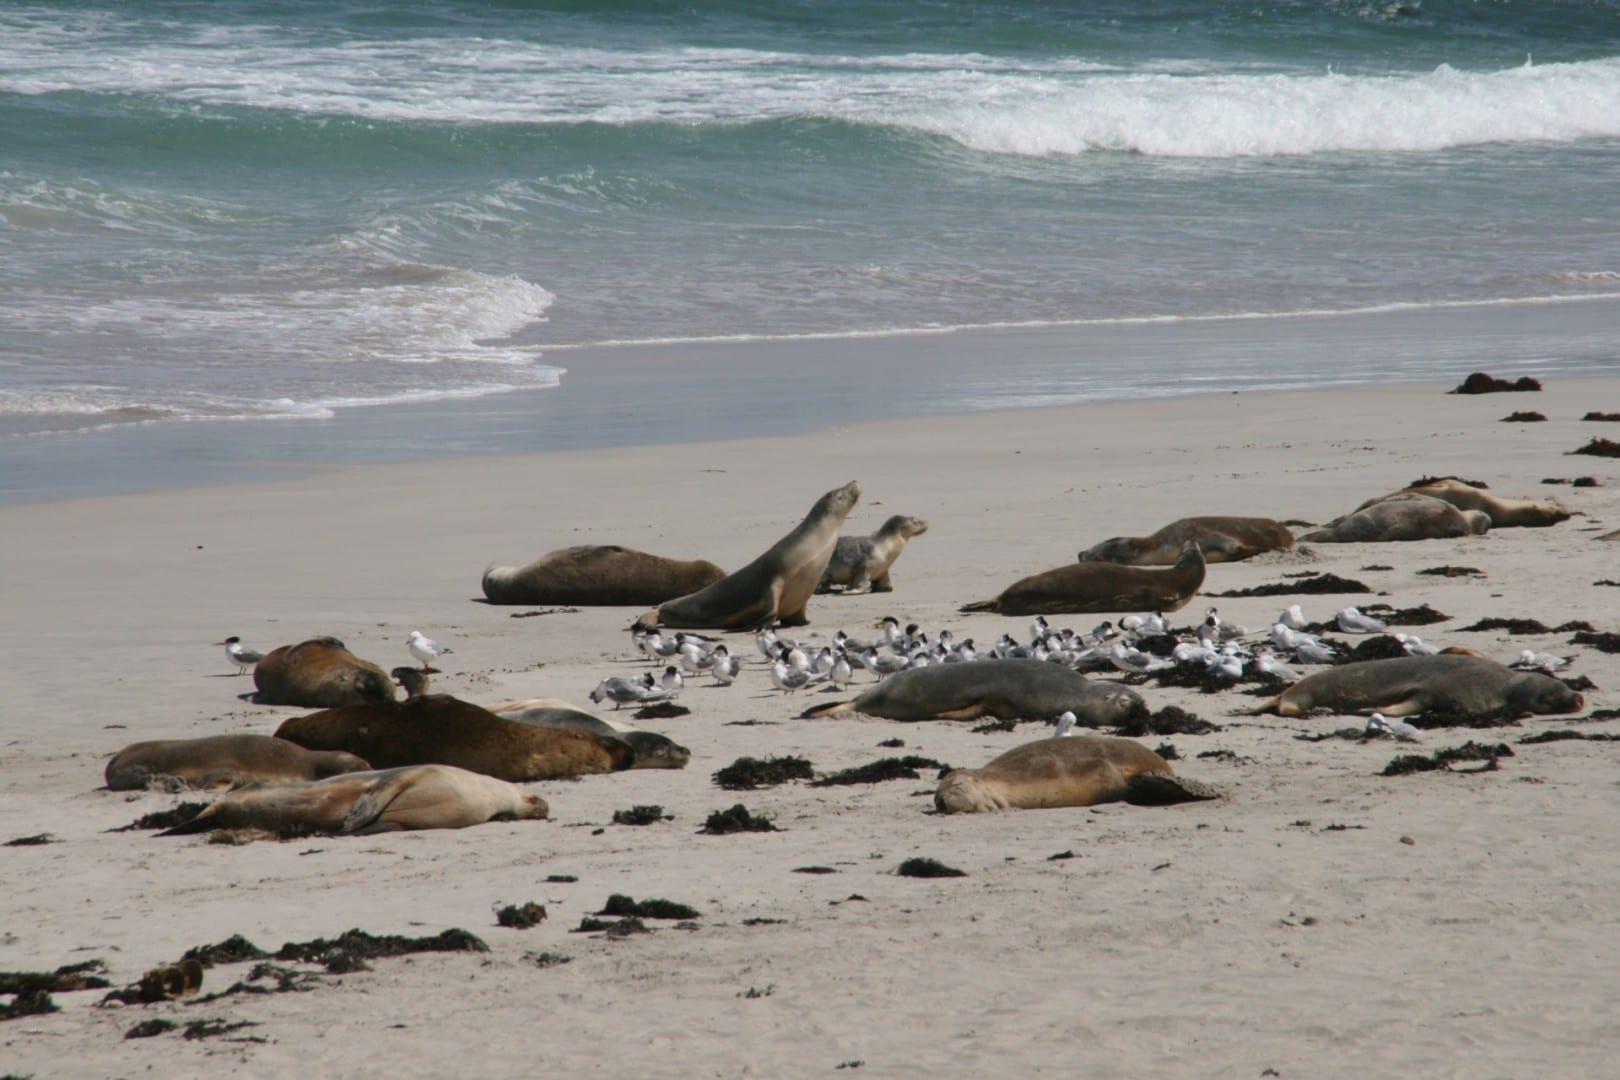 Leones marinos australianos en la playa de Seal Bay Kangaroo Island Australia